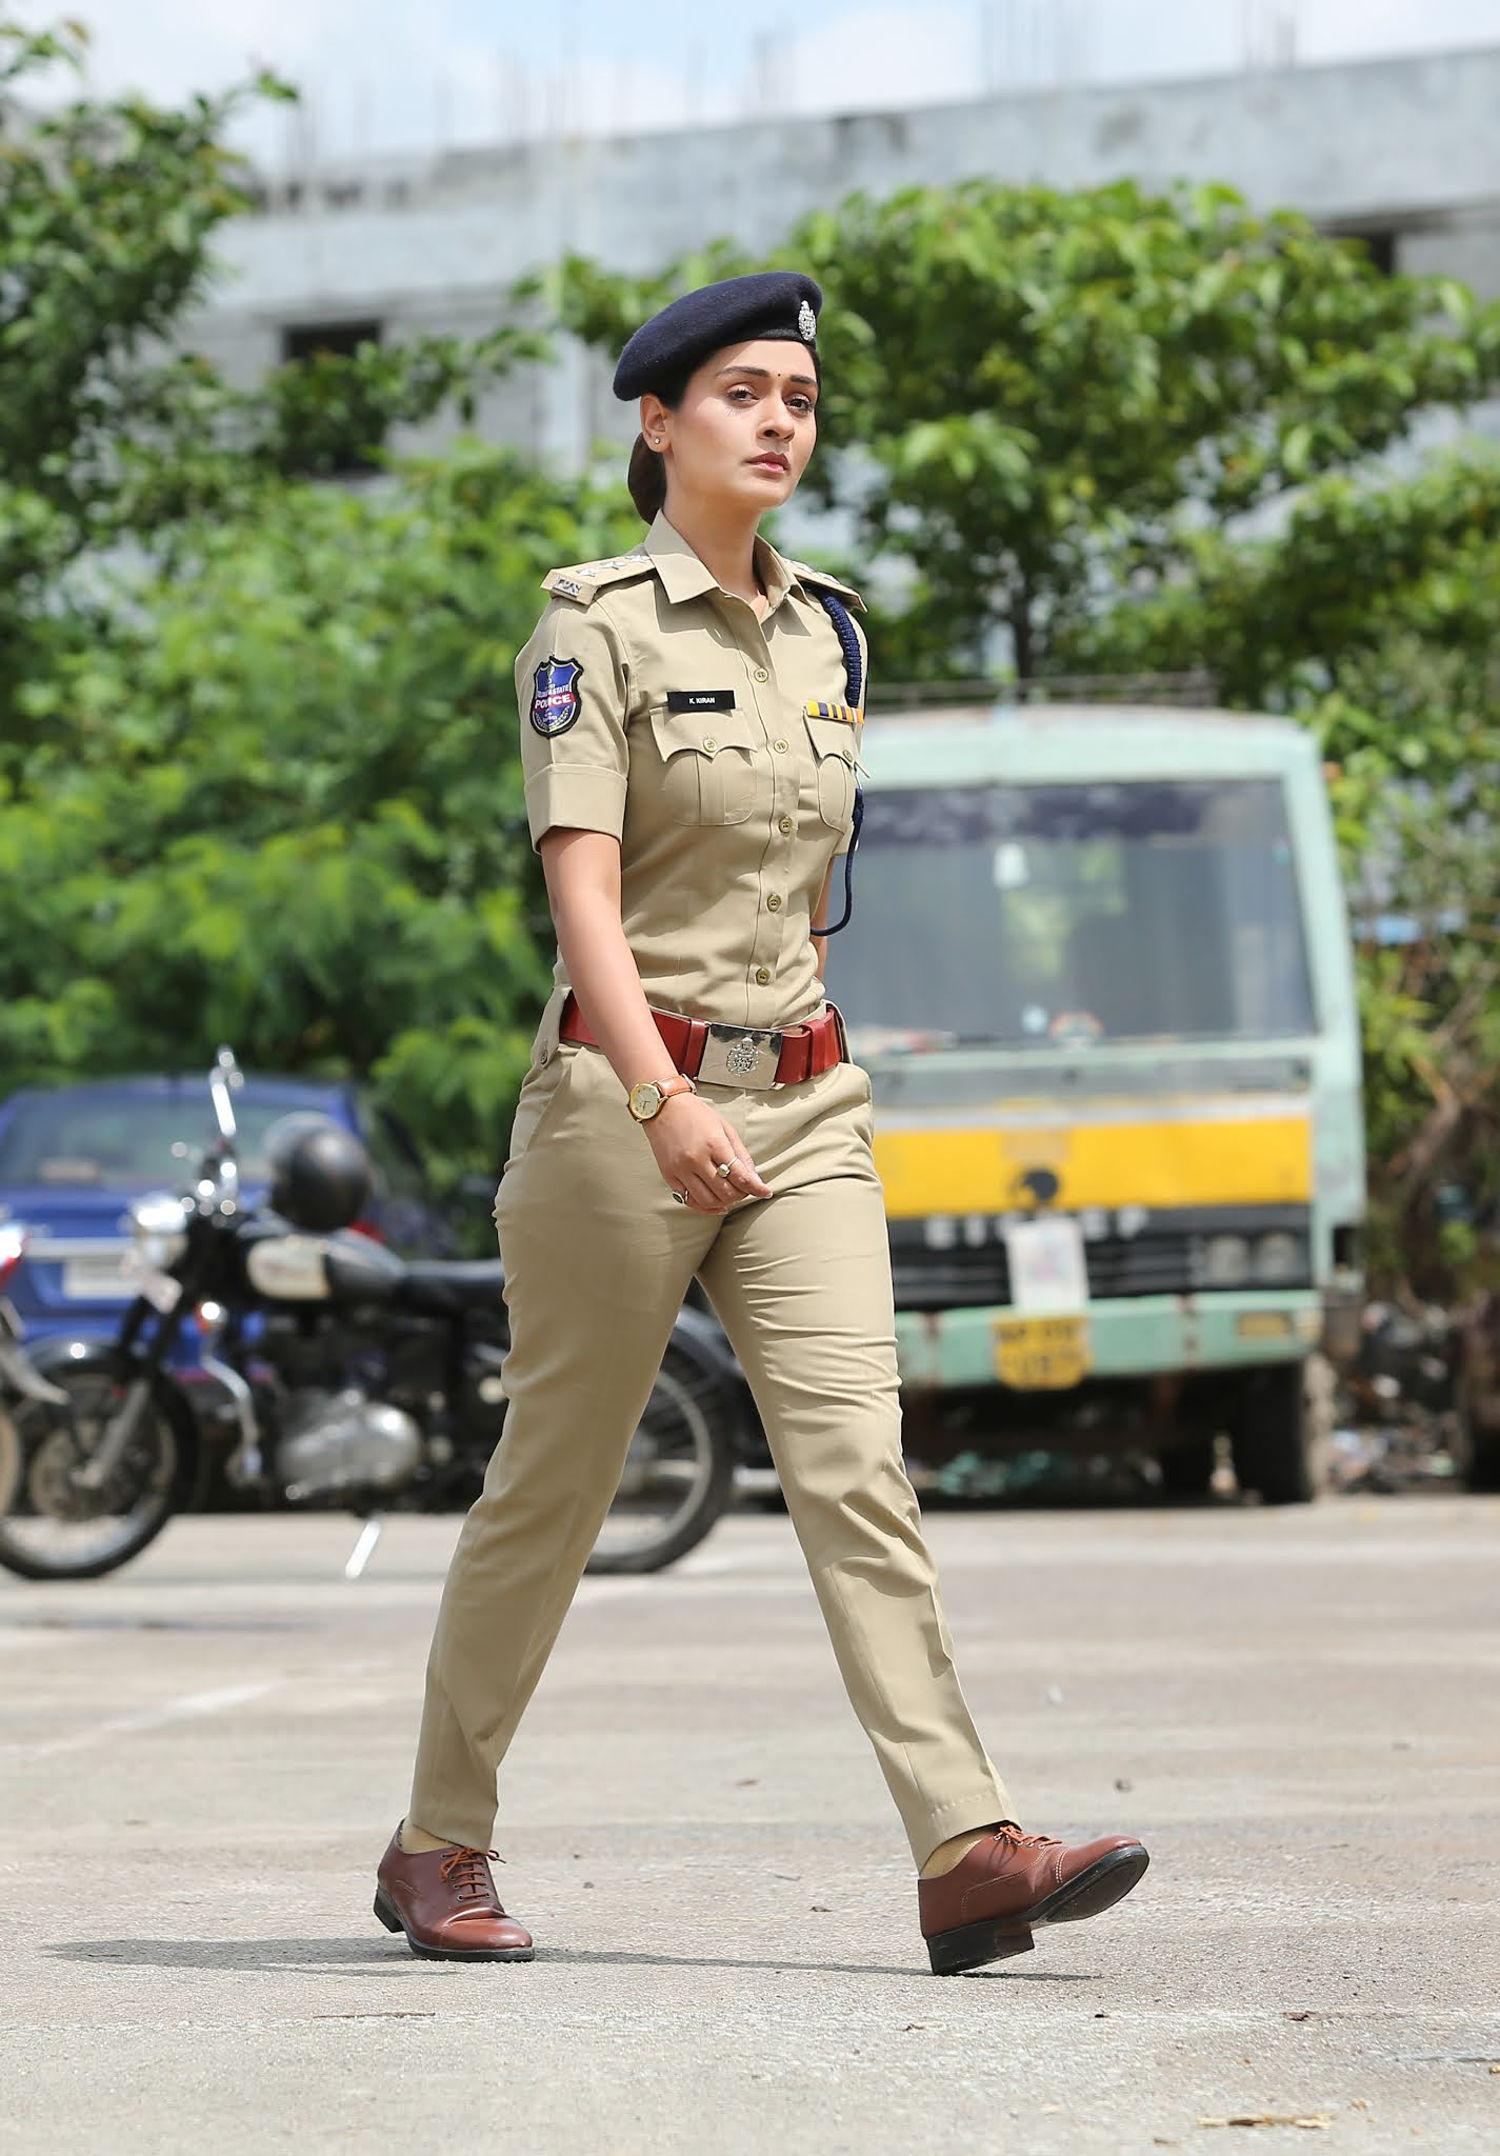 Heroine Payal Rajput 5WS Movie release in January